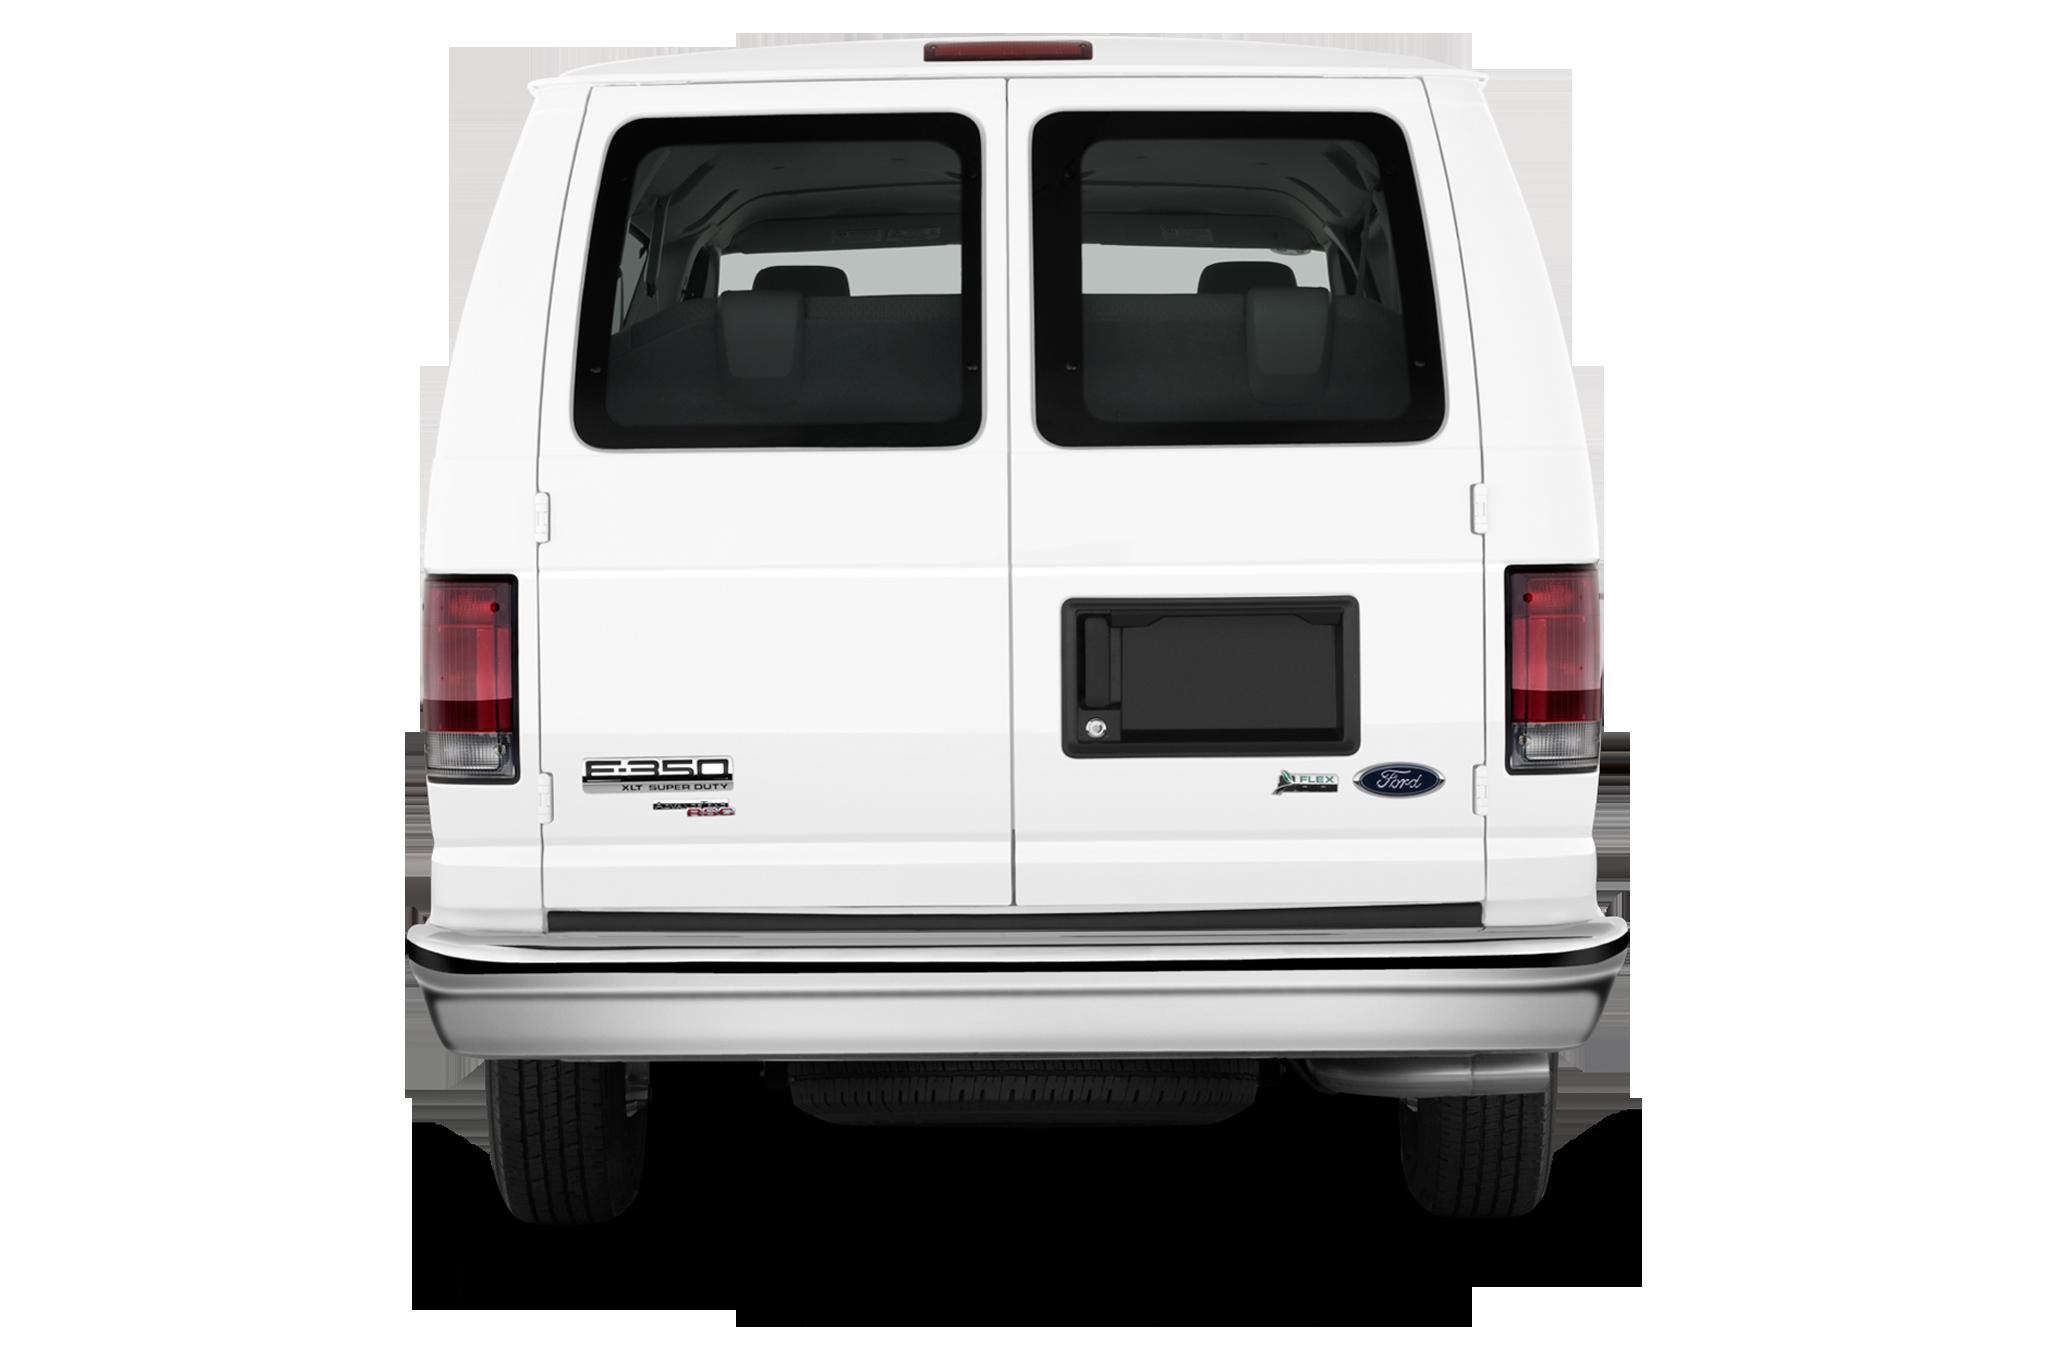 2017 Ford Econoline Van >> Ford Replacing E-Series Van with European Transit